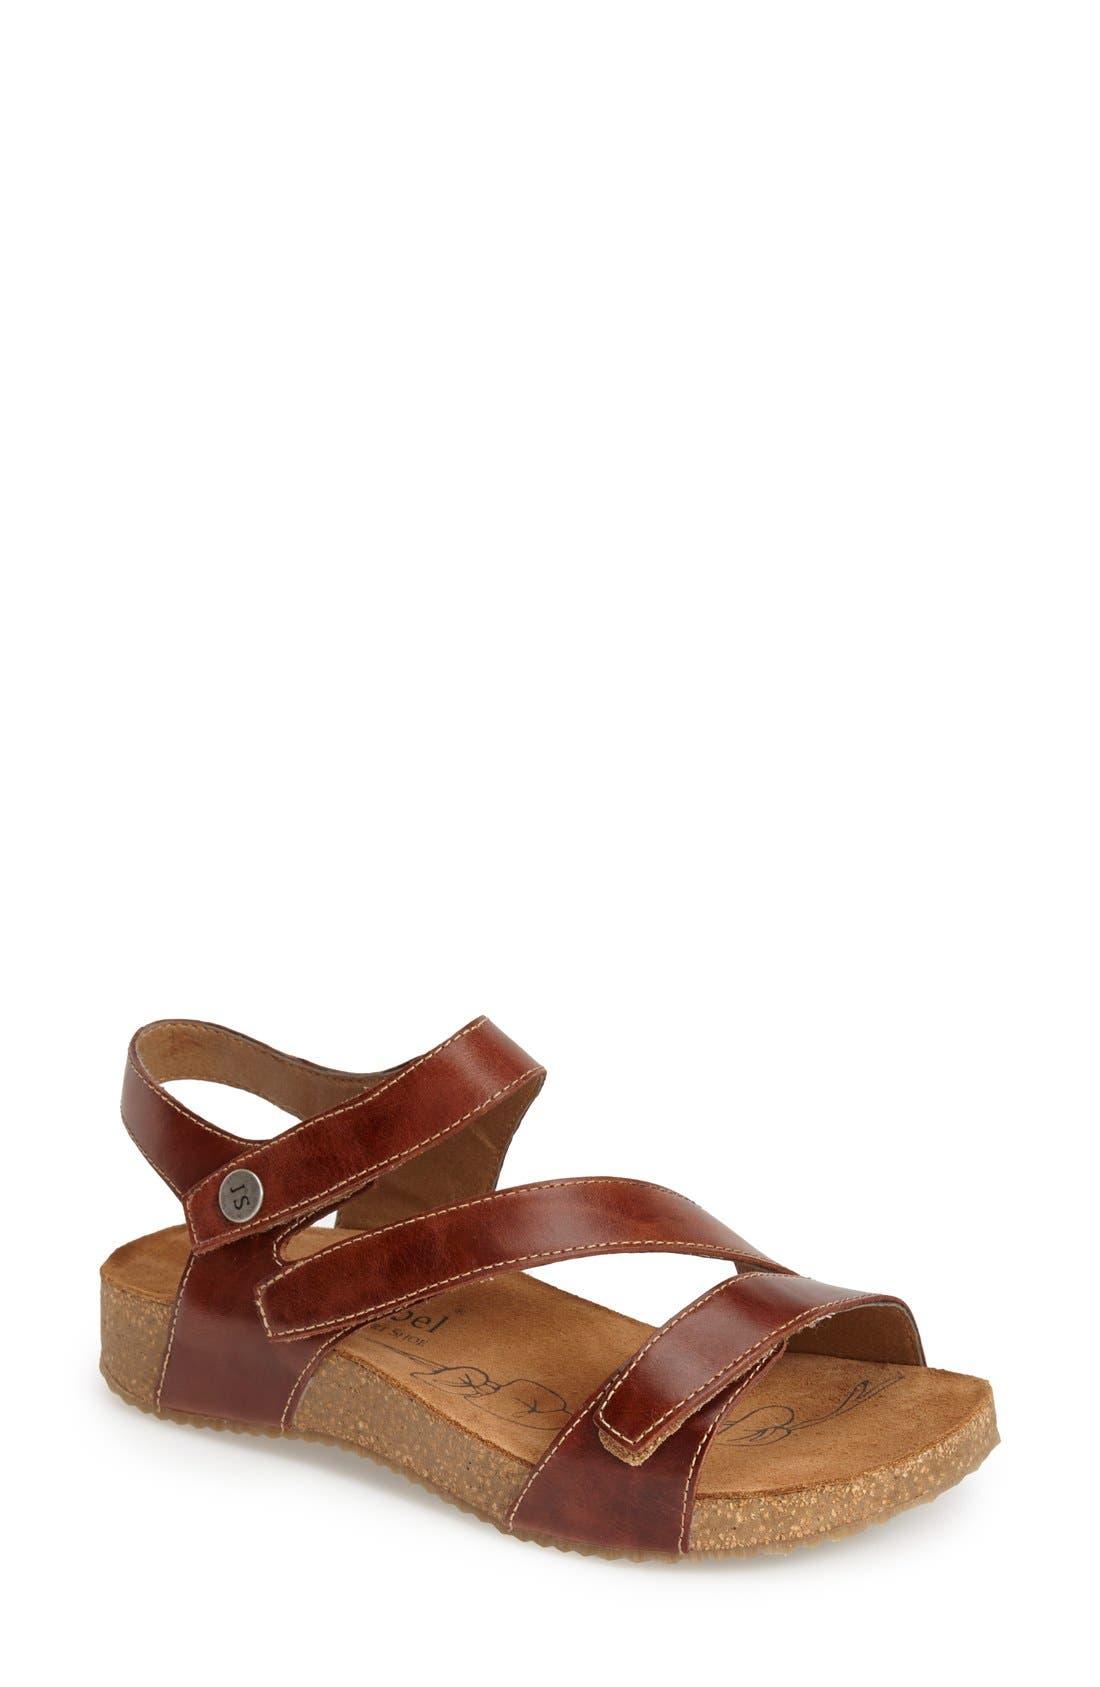 Alternate Image 1 Selected - Josef Seibel 'Tonga' Leather Sandal (Women)